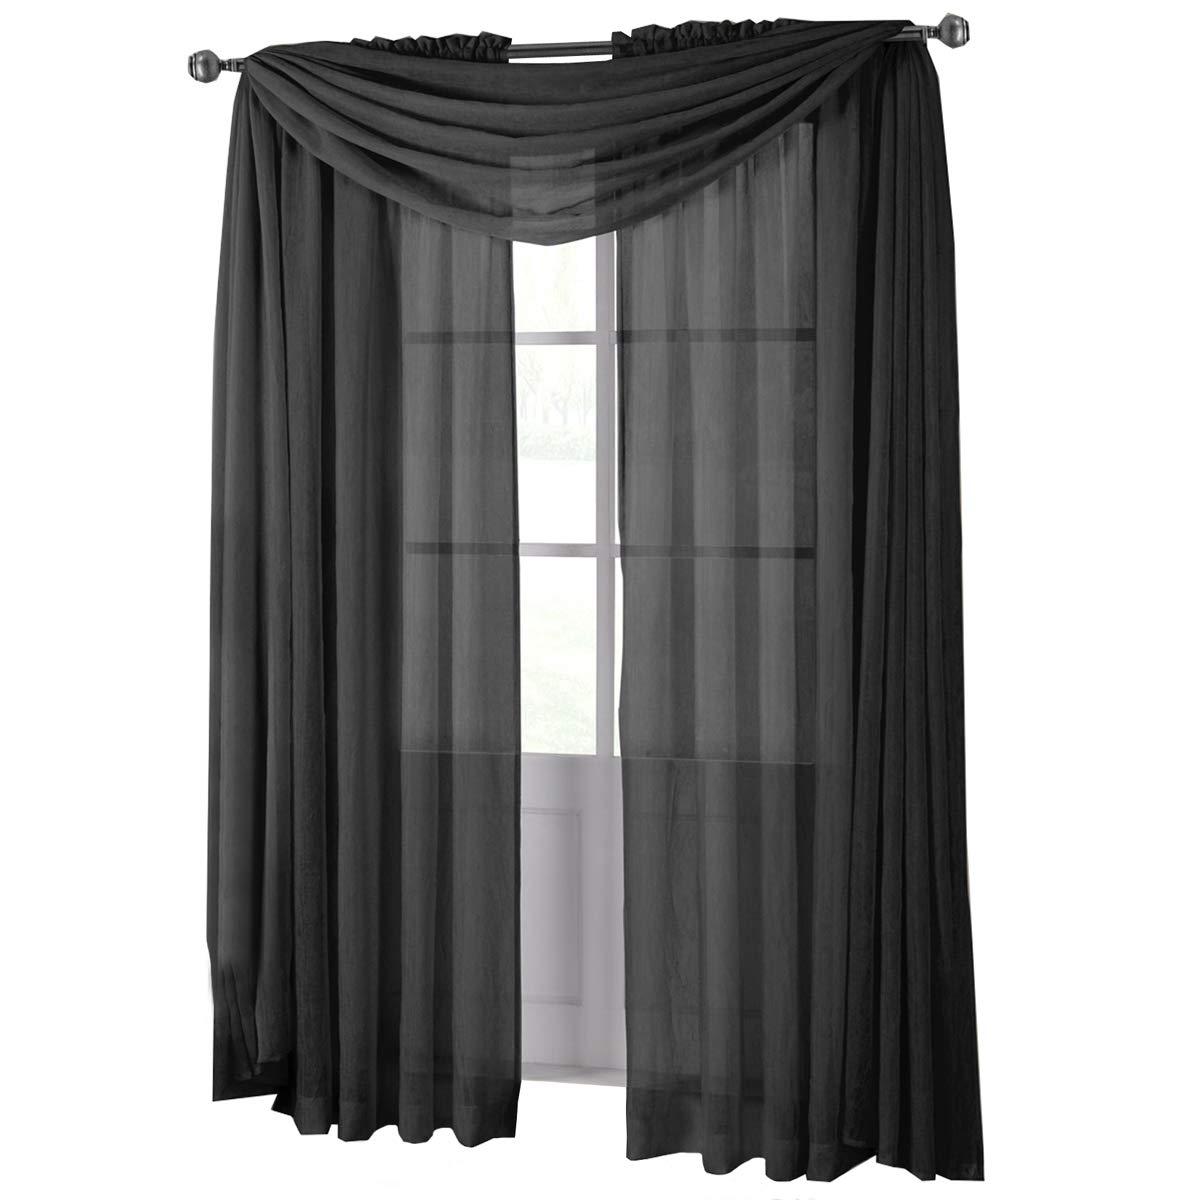 bfe5791e1da Amazon.com  Royal Hotel Abri Black Rod Pocket Crushed Sheer Curtain Panel